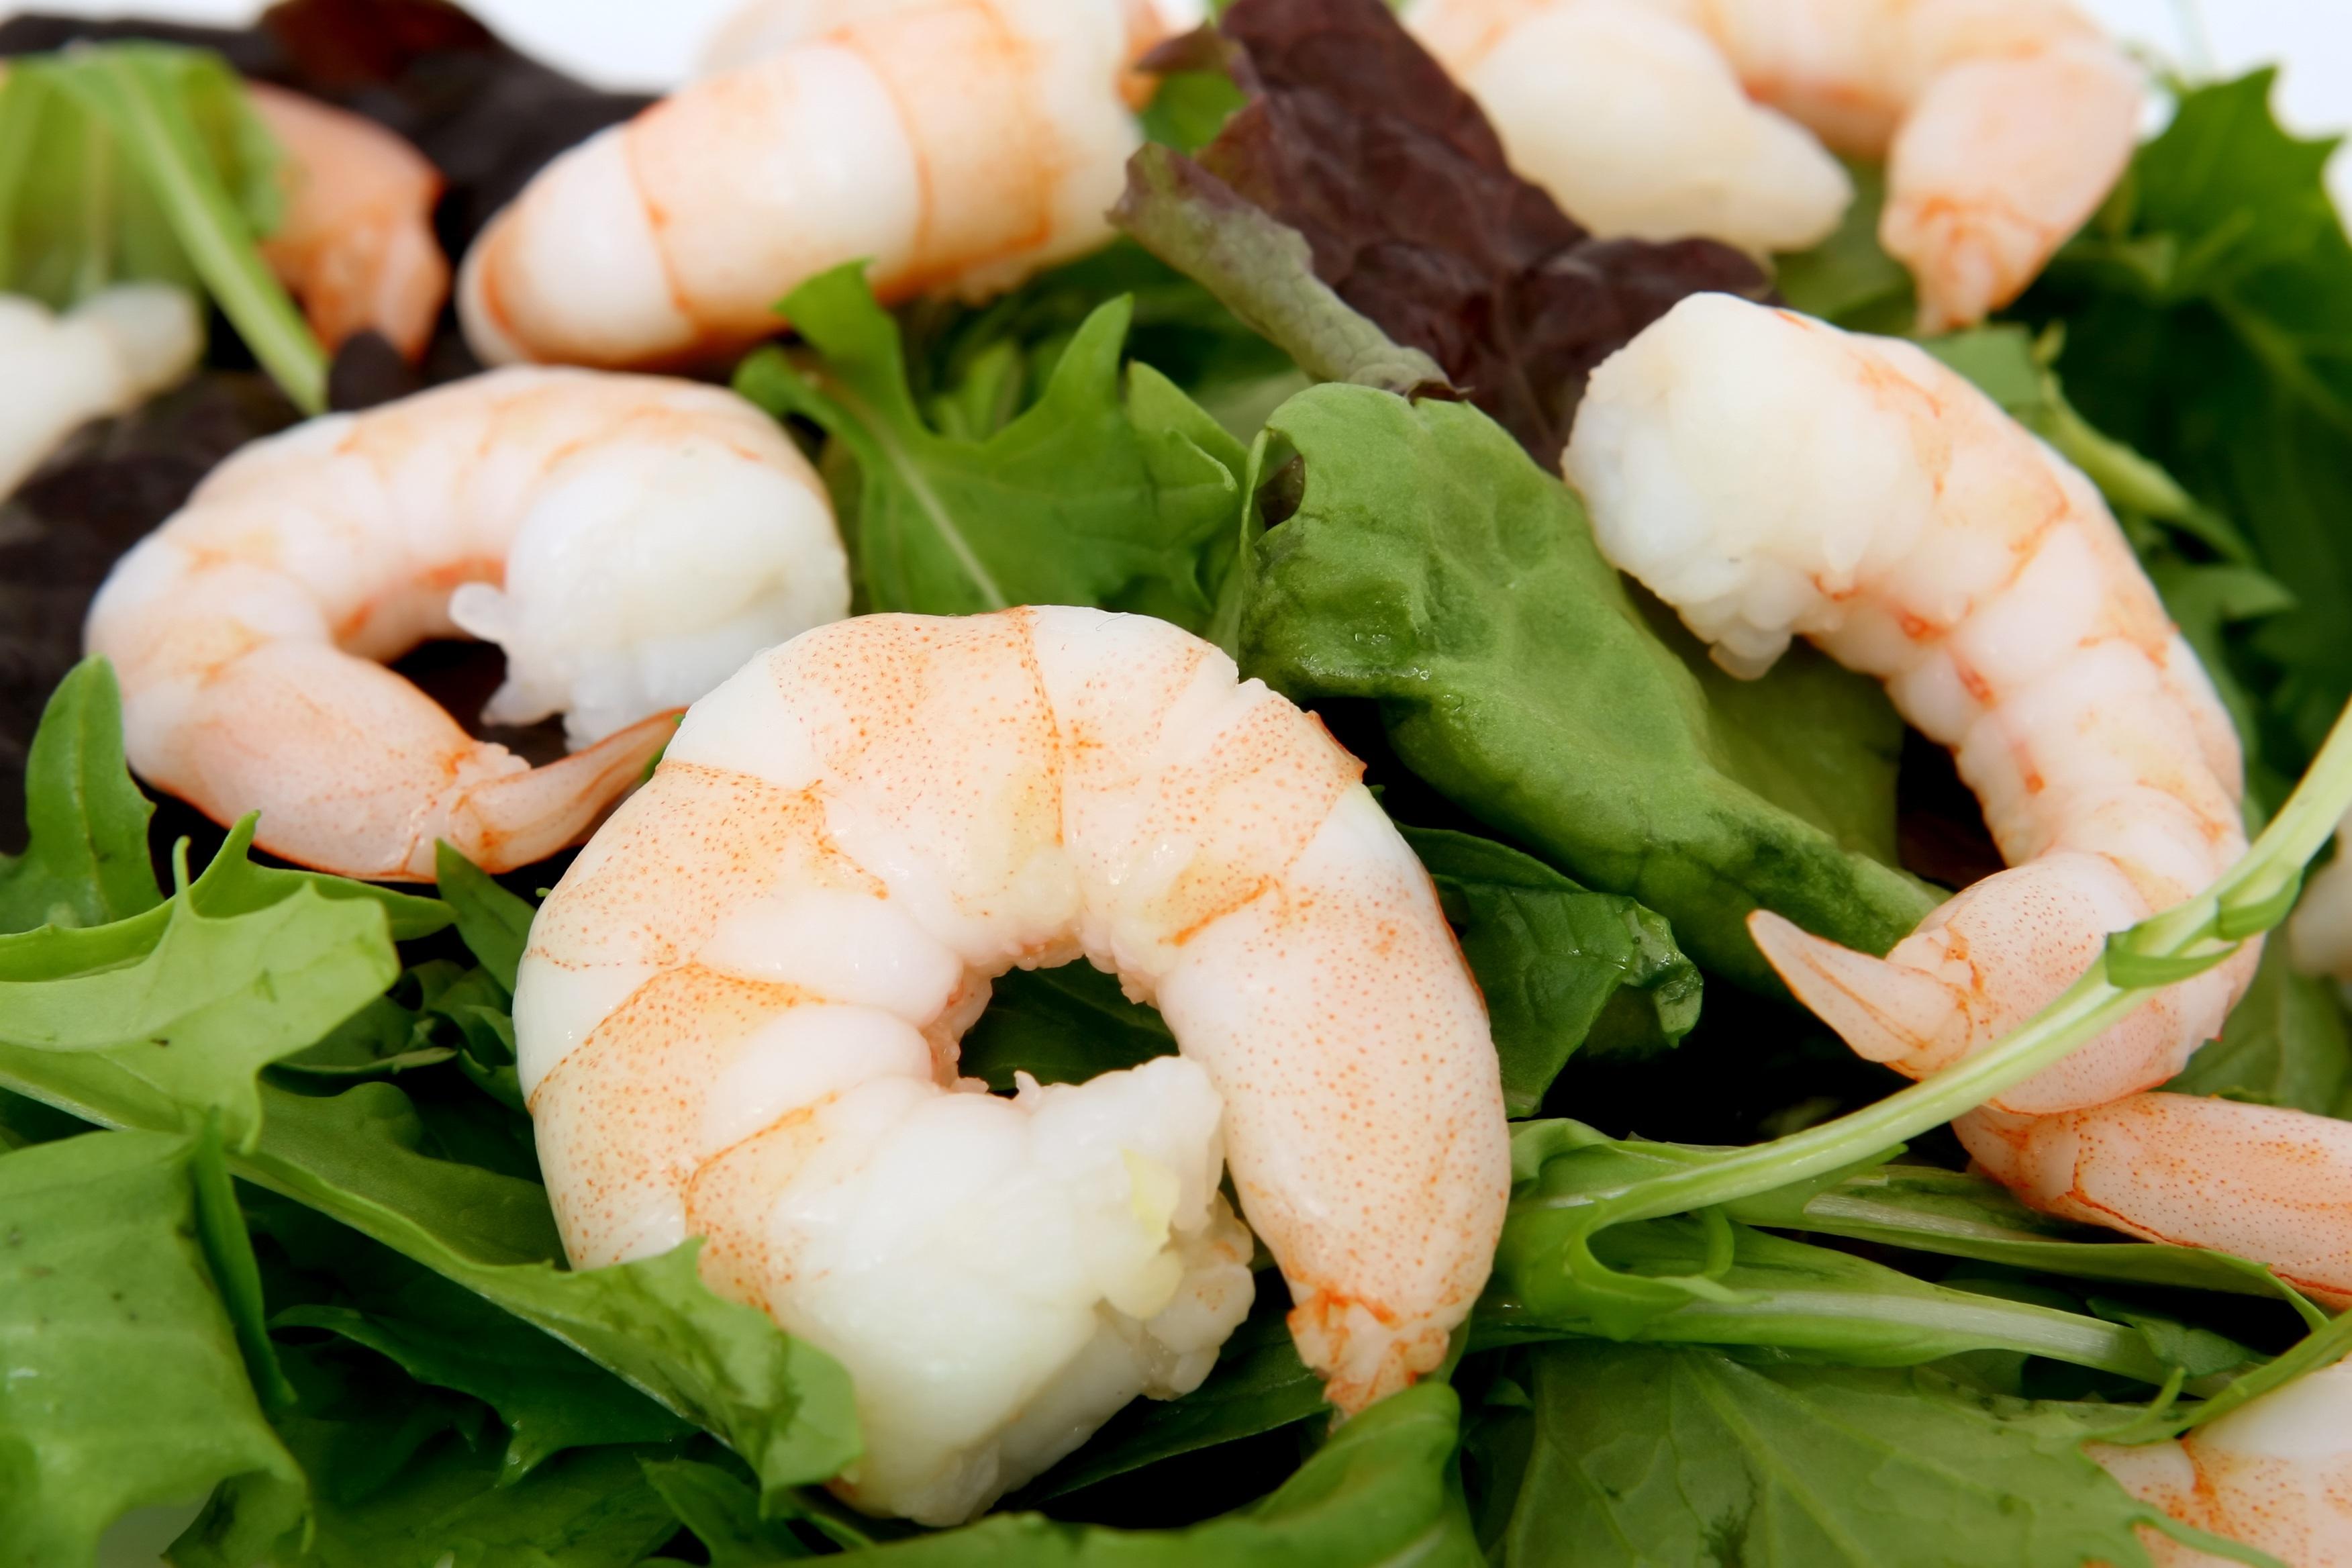 Gambar Restoran Asia Hidangan Salad Hijau Cina Alam